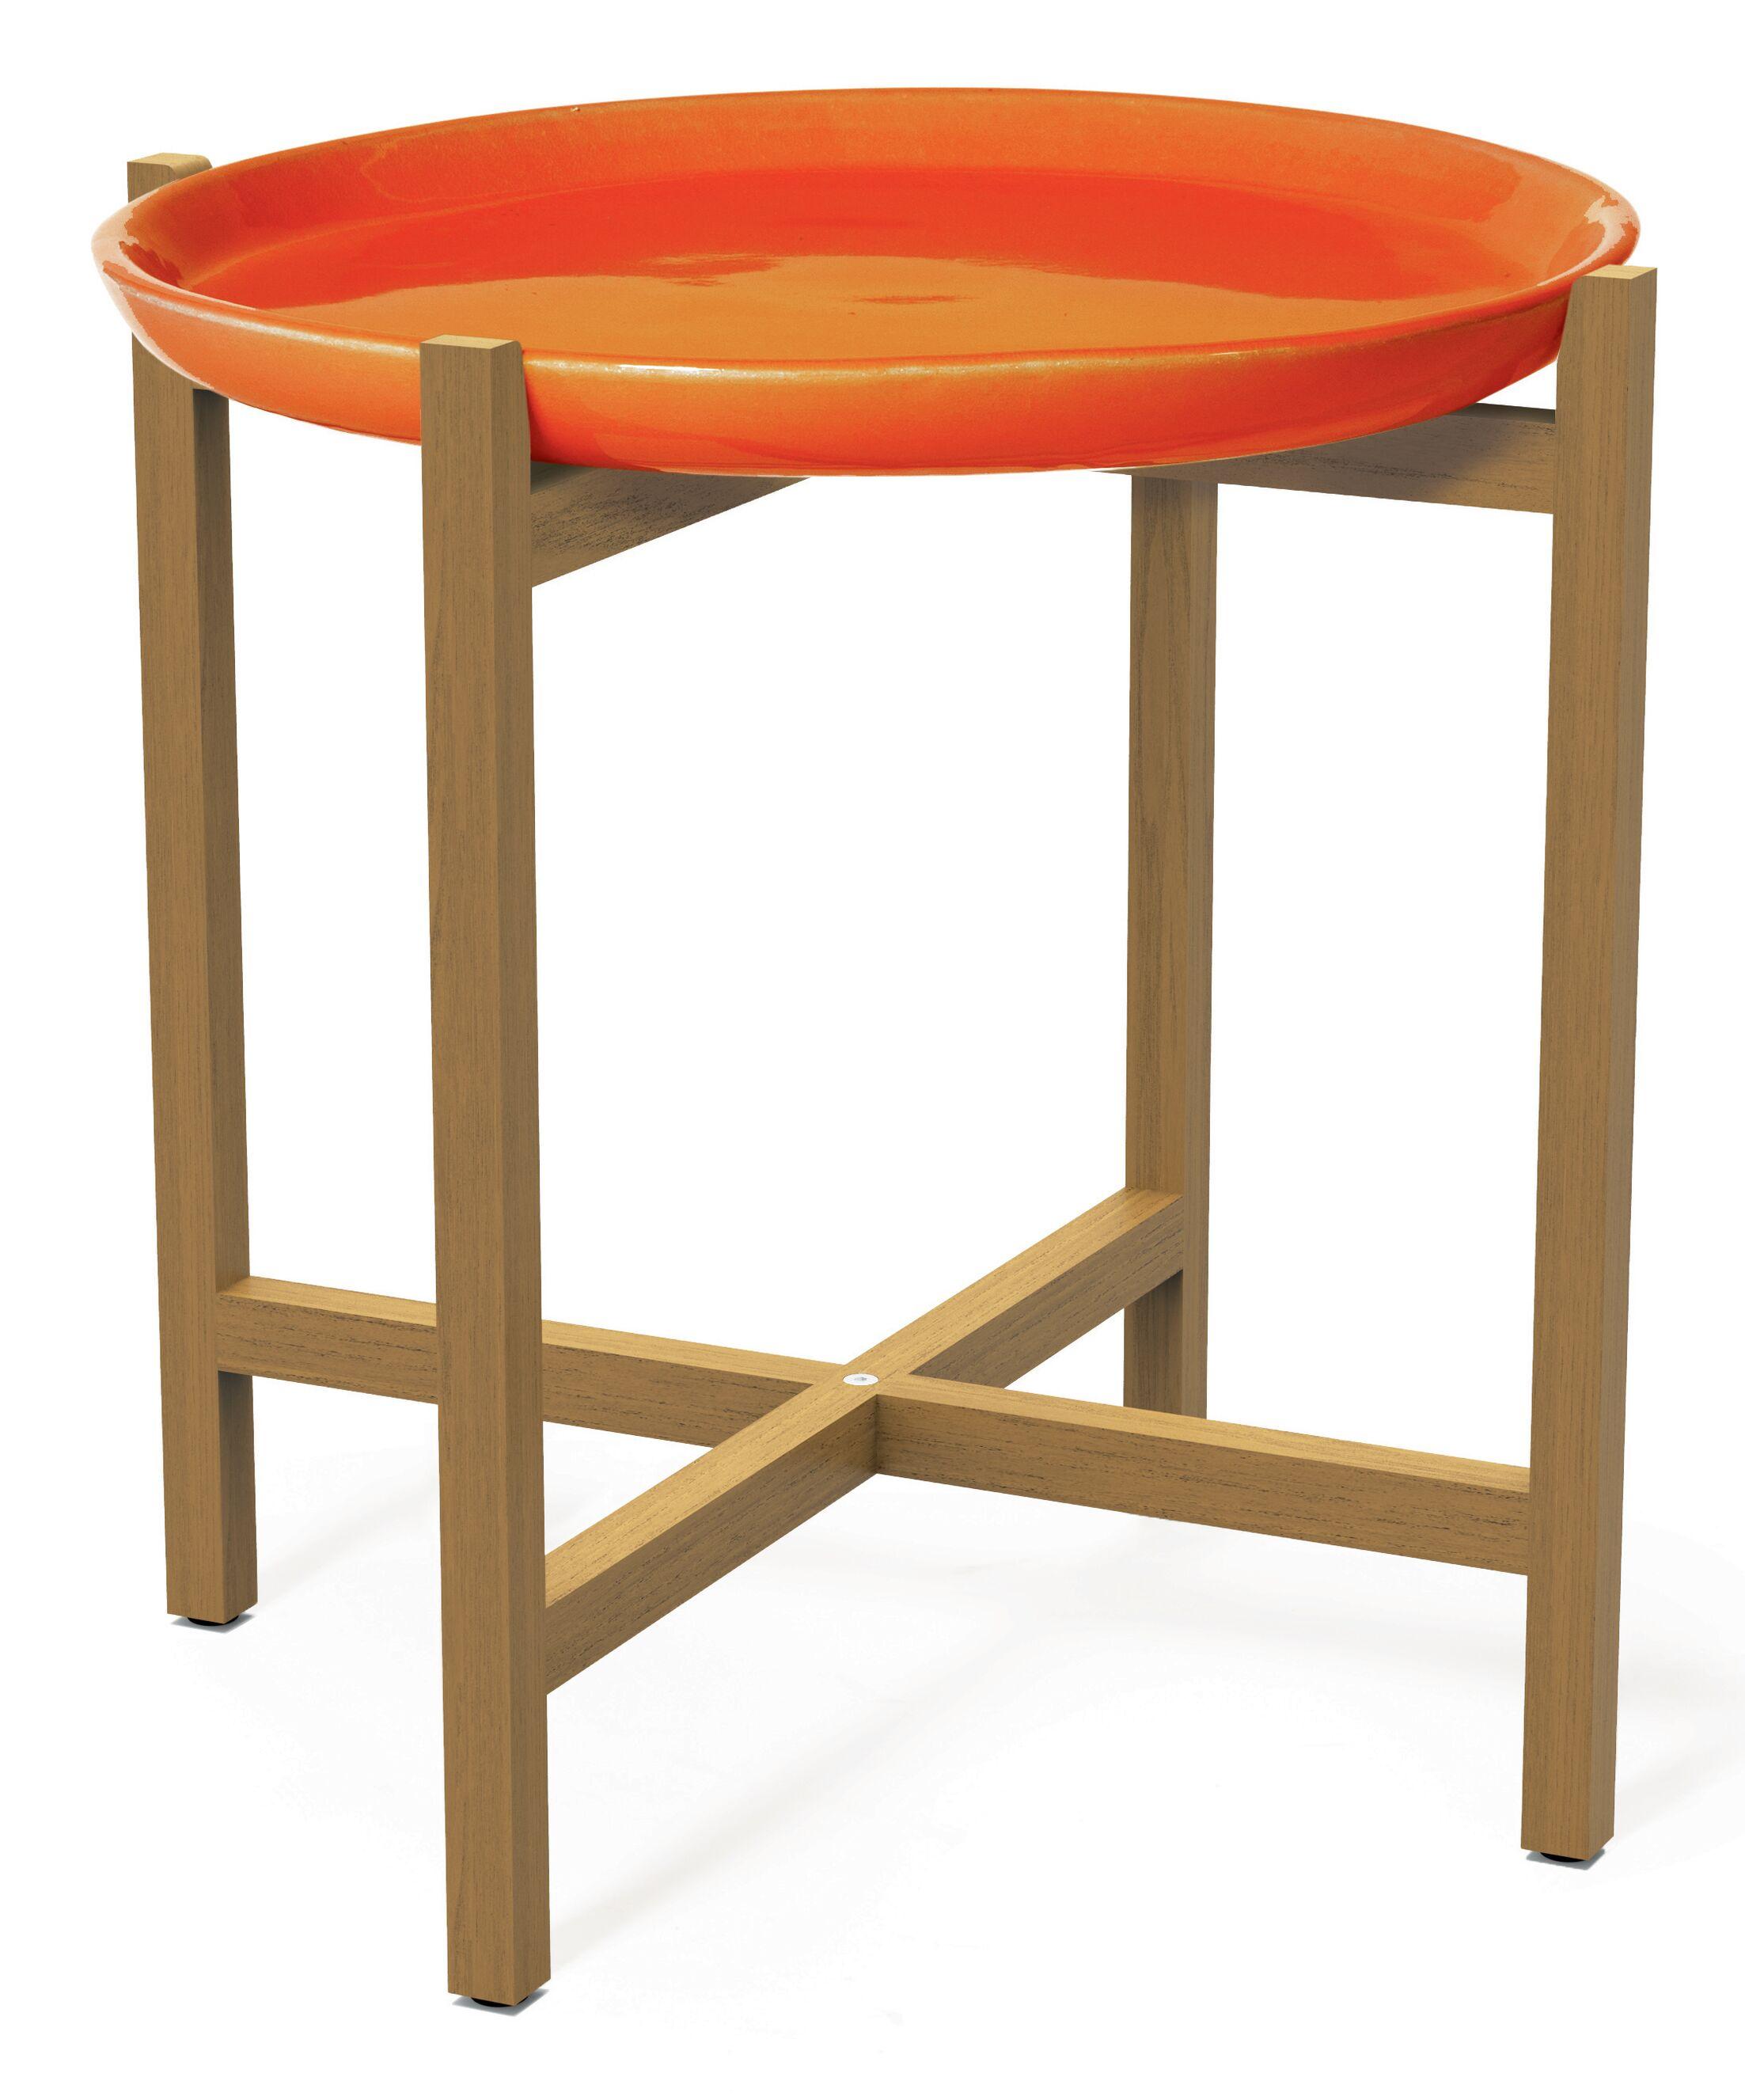 Ibis Teak Side Table Top Color: Orange